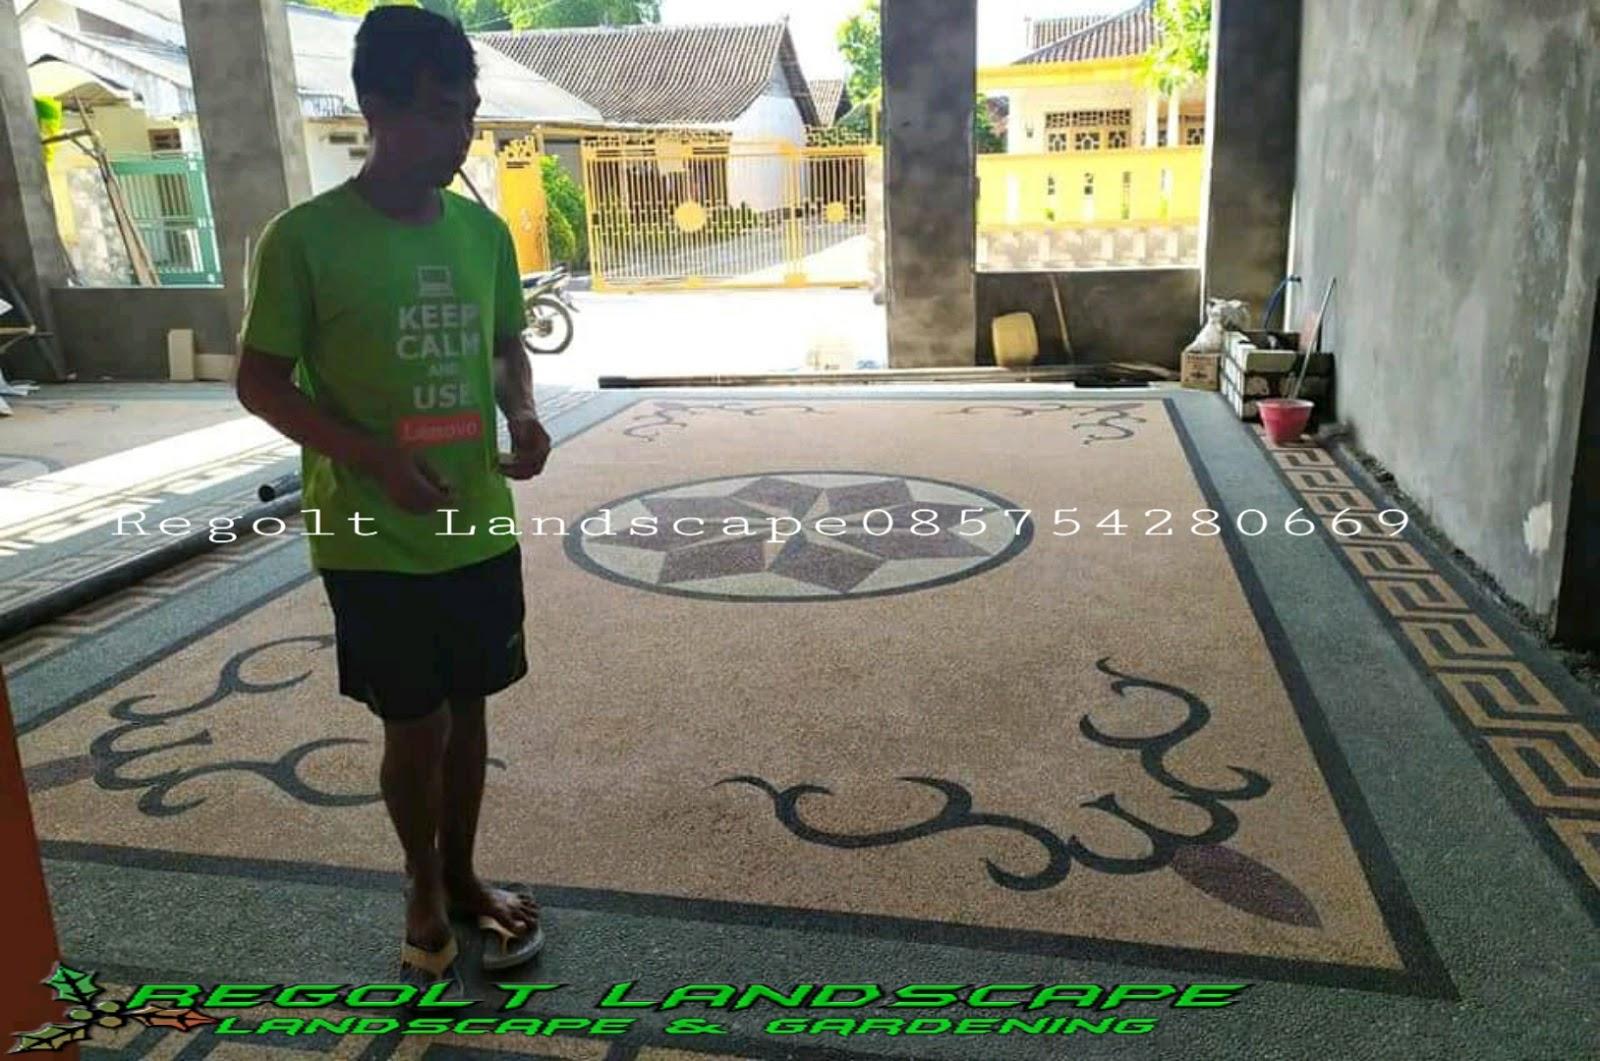 Jasa Tukang Pembuatan Batu Sikat, Carport, Ampyangan Di Surabaya